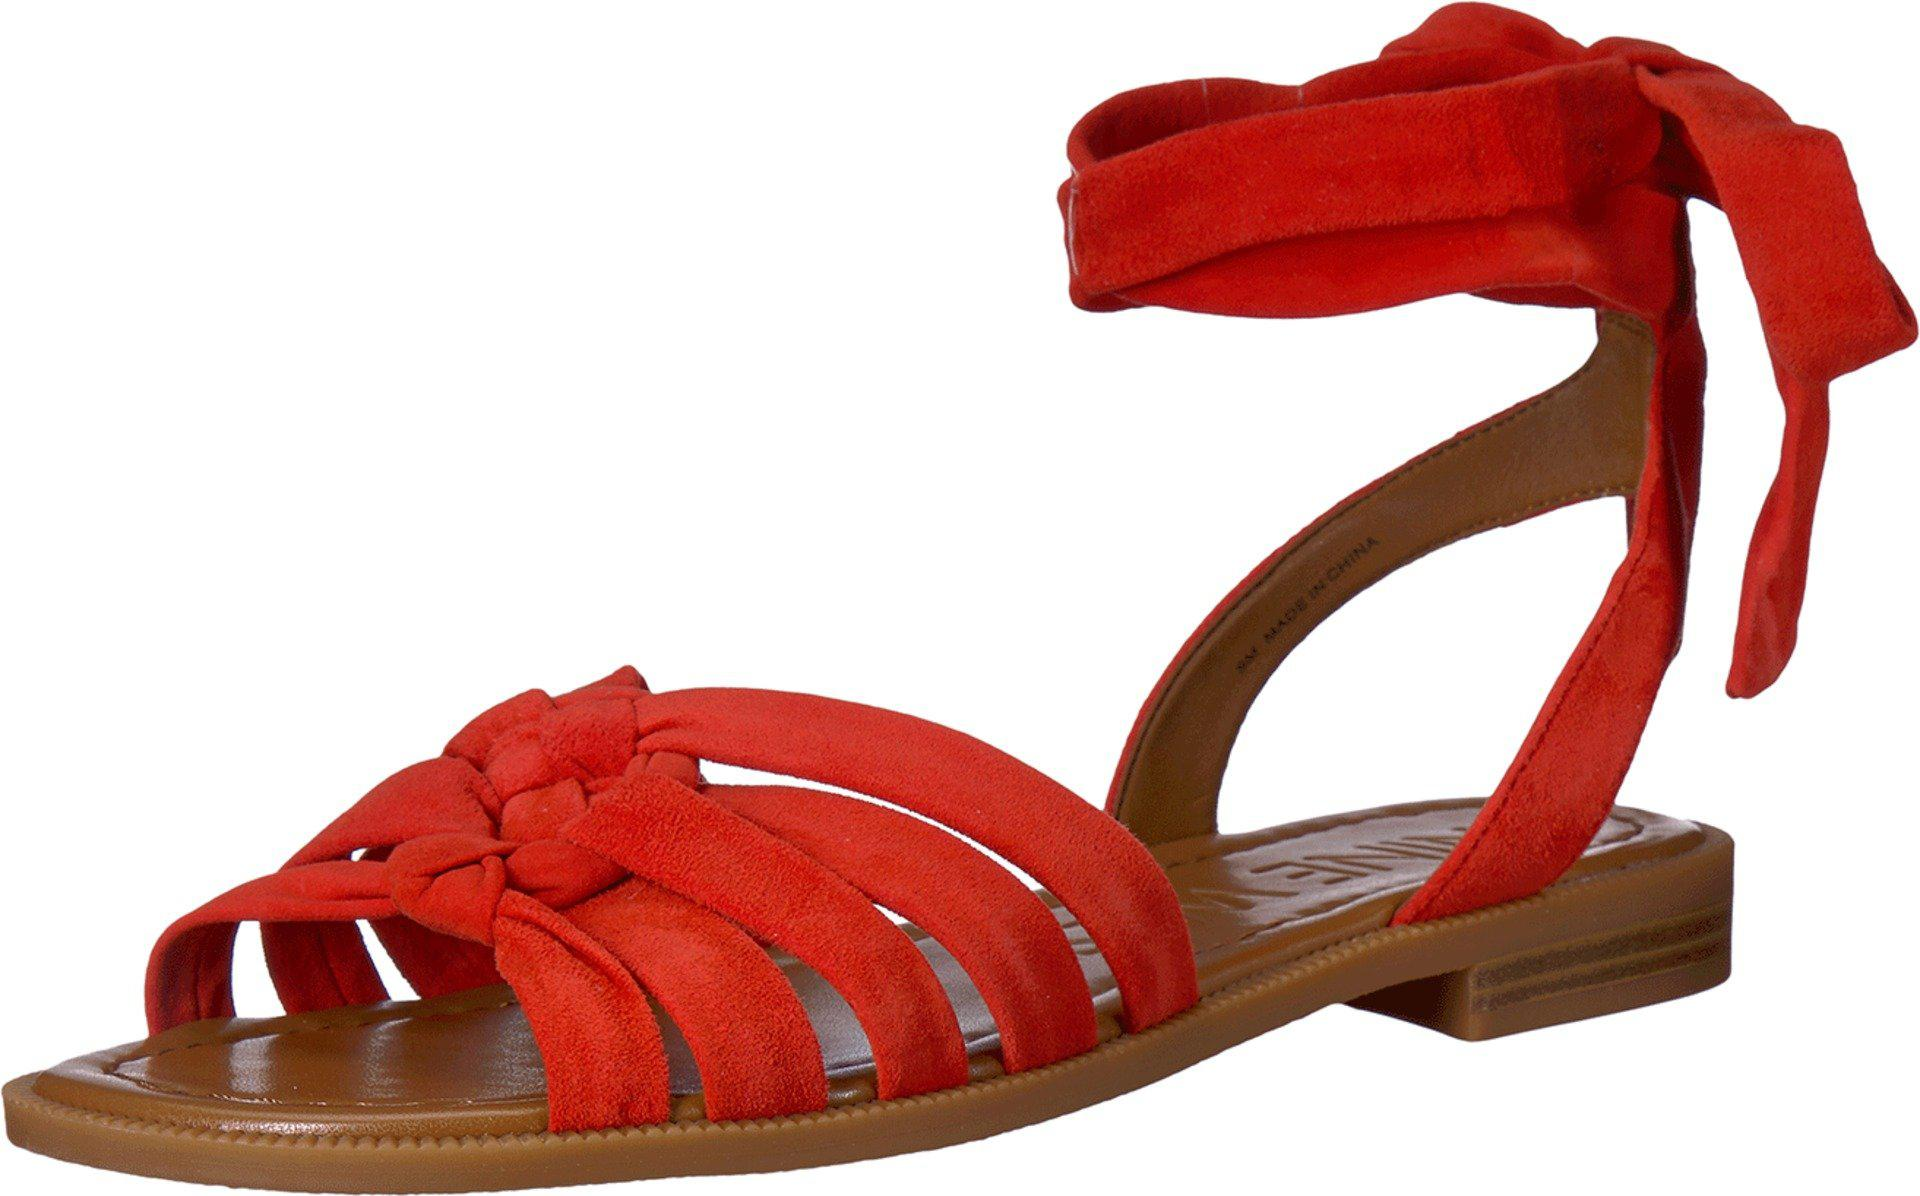 Xameera Wrap Sandal Nine West EnH6UENV